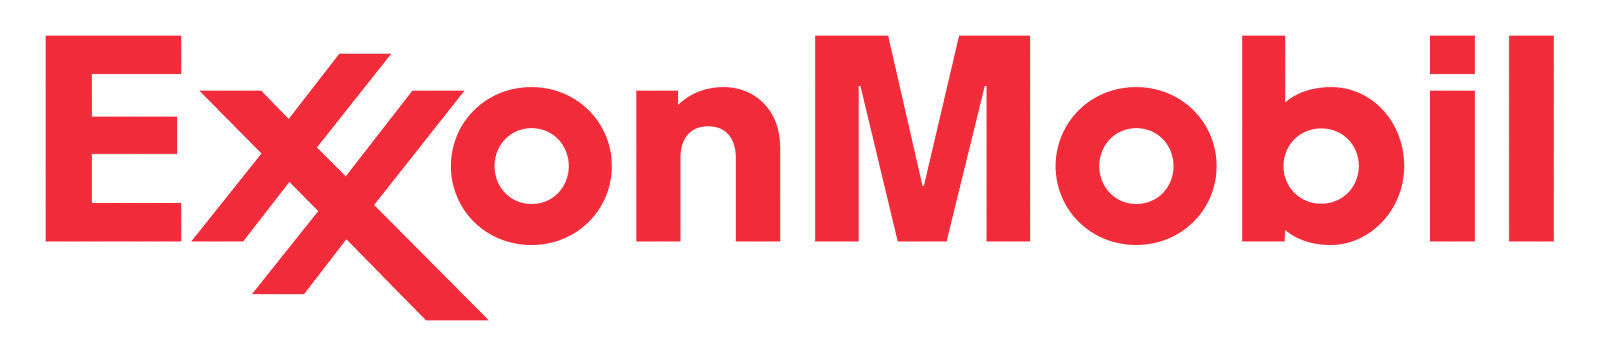 ExxonMobil_logo_red.png